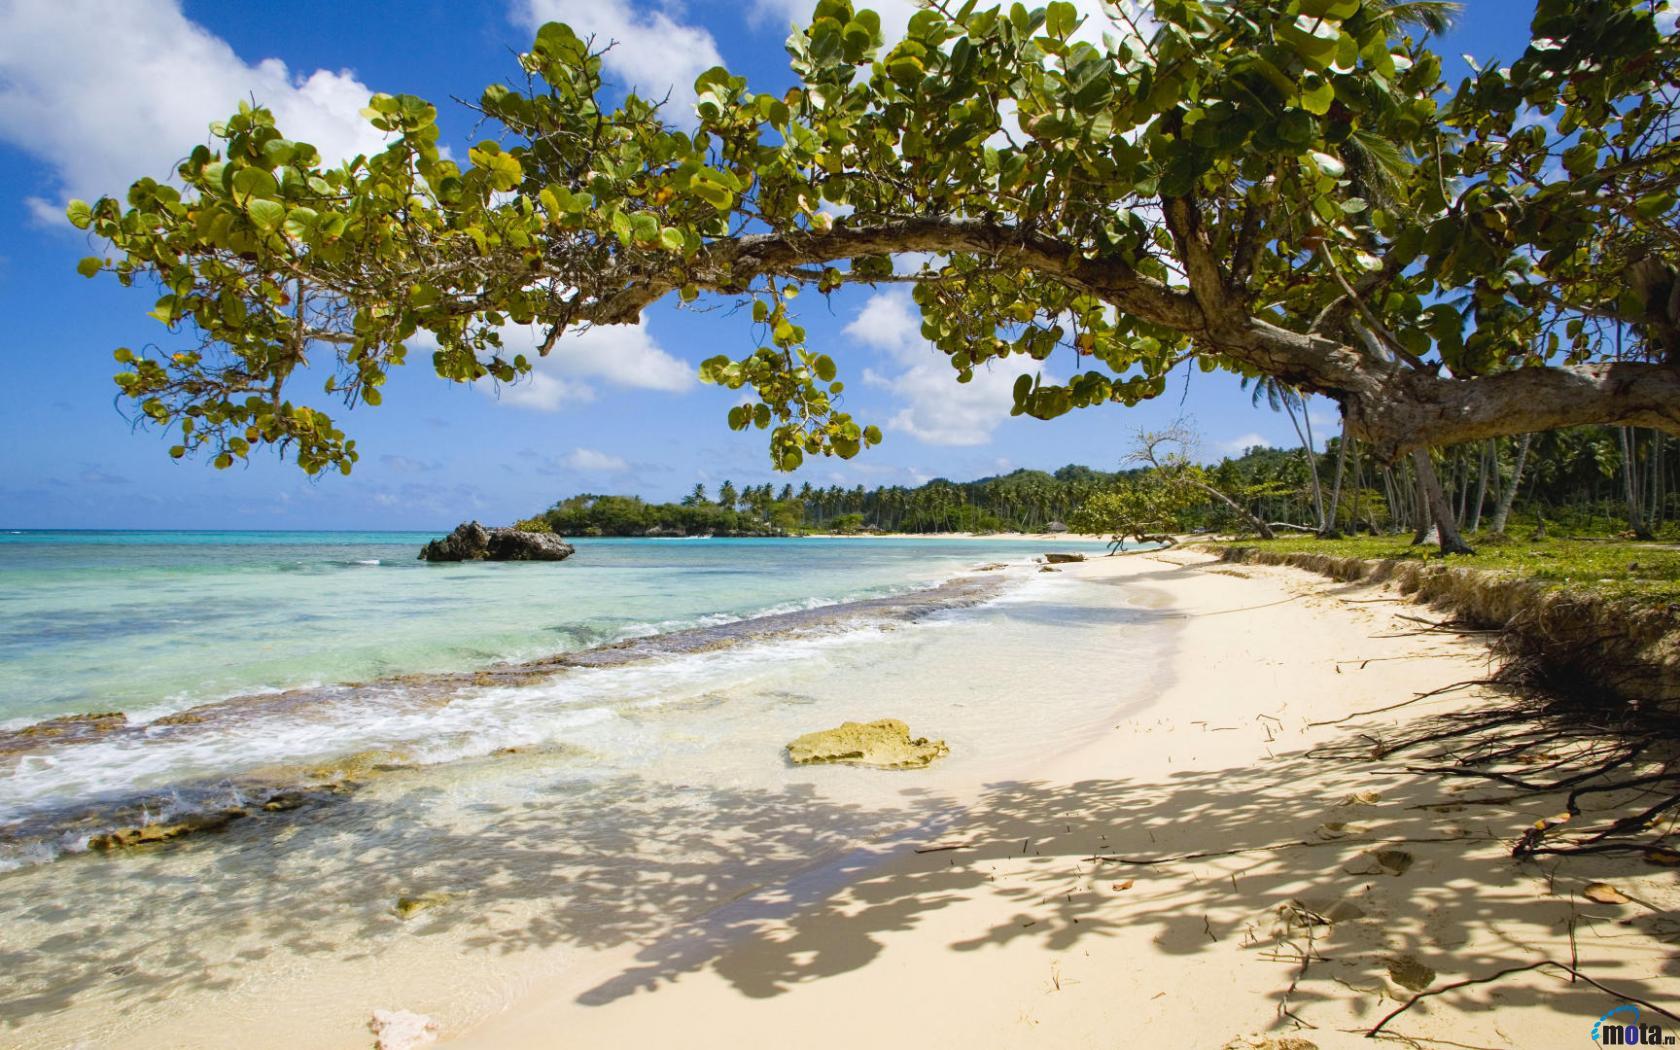 Download Wallpaper Playa Rincon Dominican Republic 1680 x 1050 1680x1050